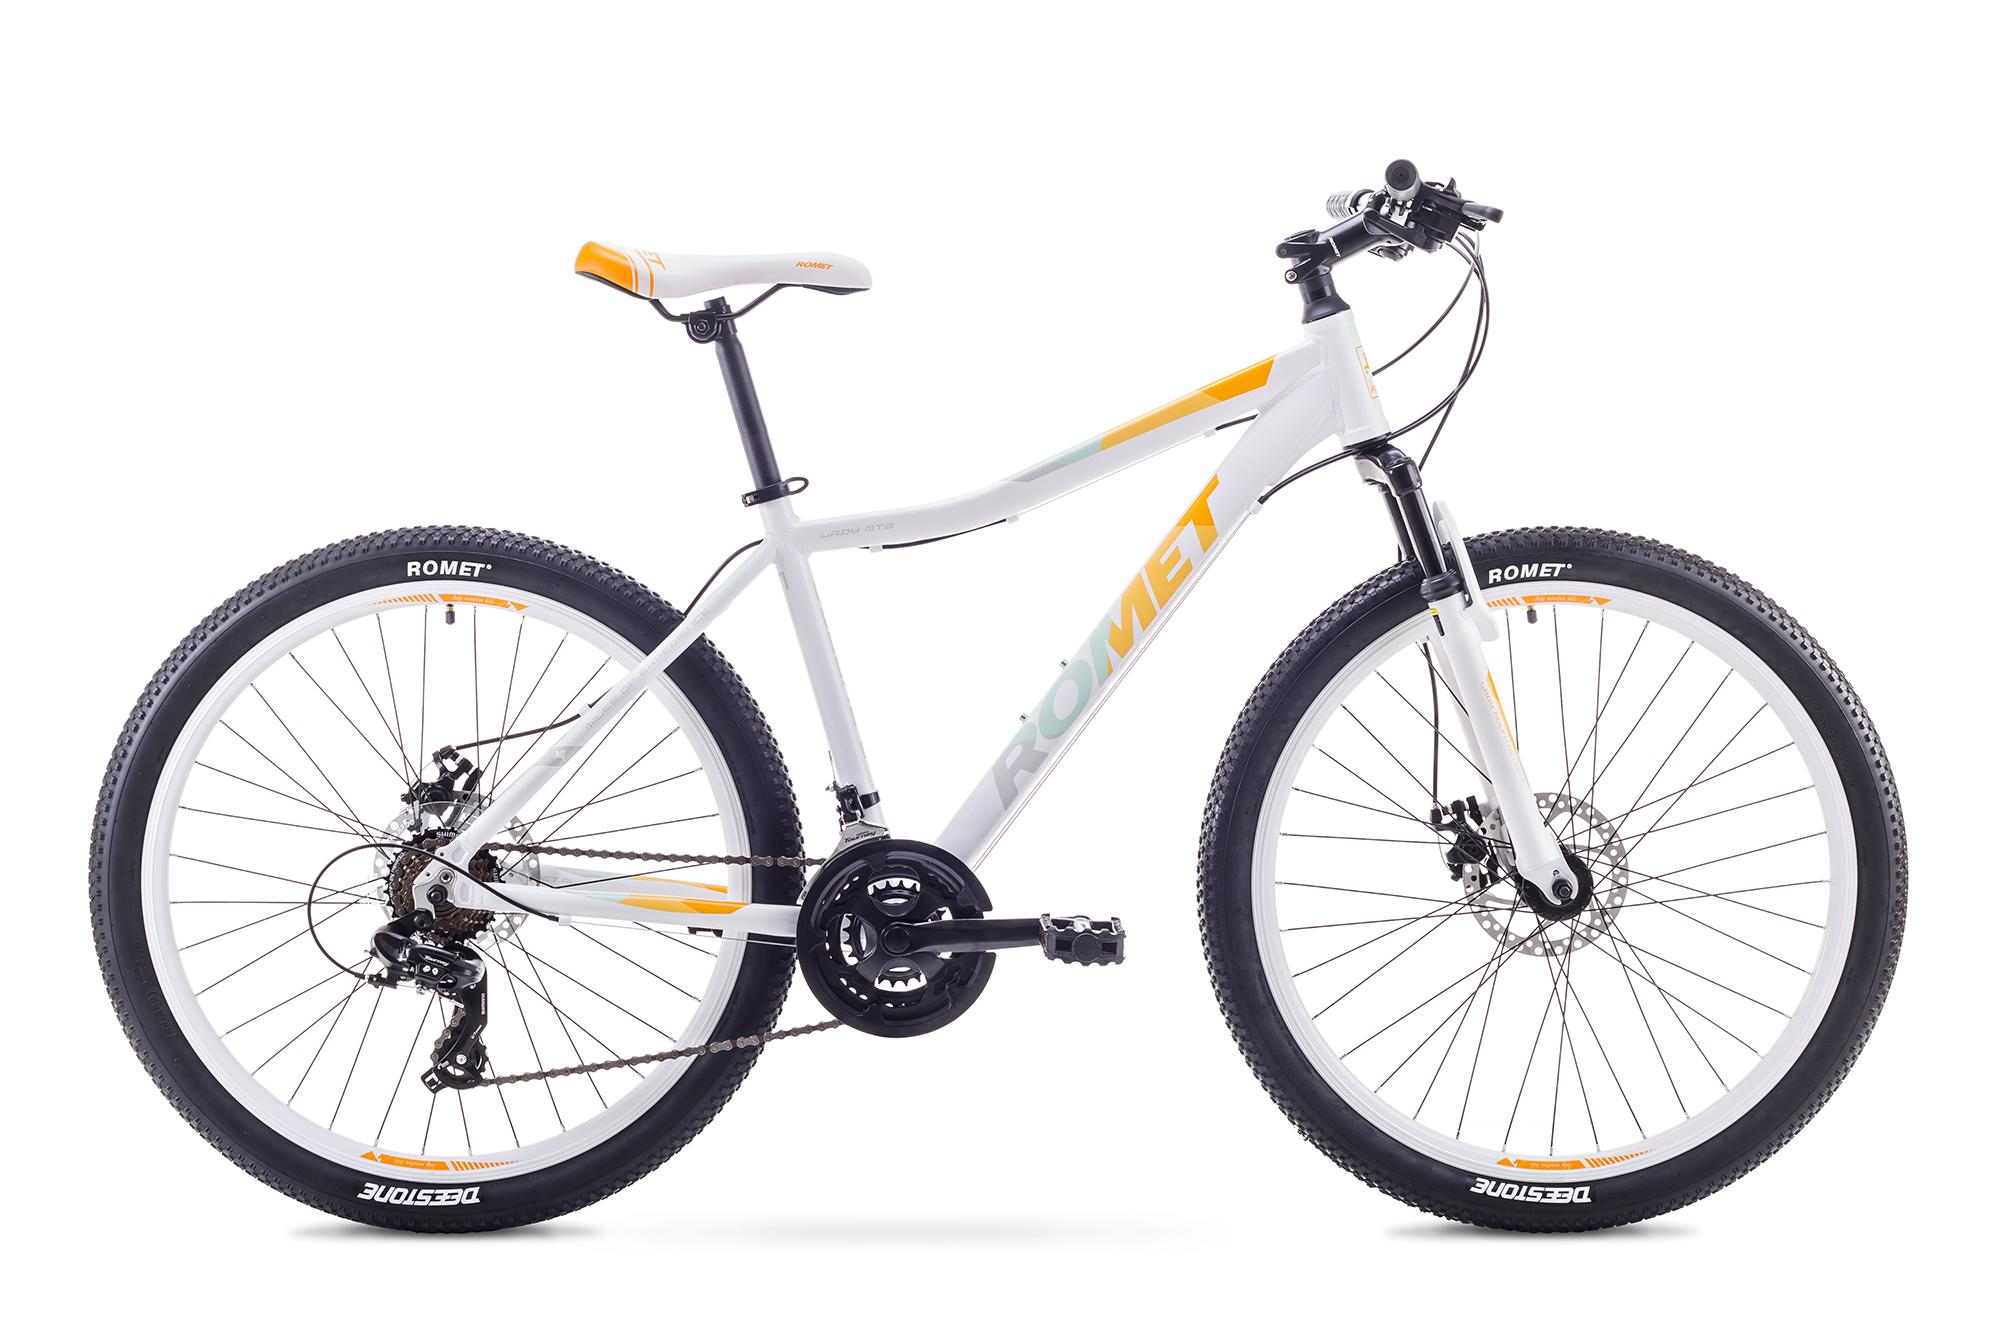 ROMET JOLENE 26 2 BAL/OR (AR) 1826708 17M VELOSIPĒDS kalnu velosipēds MTB